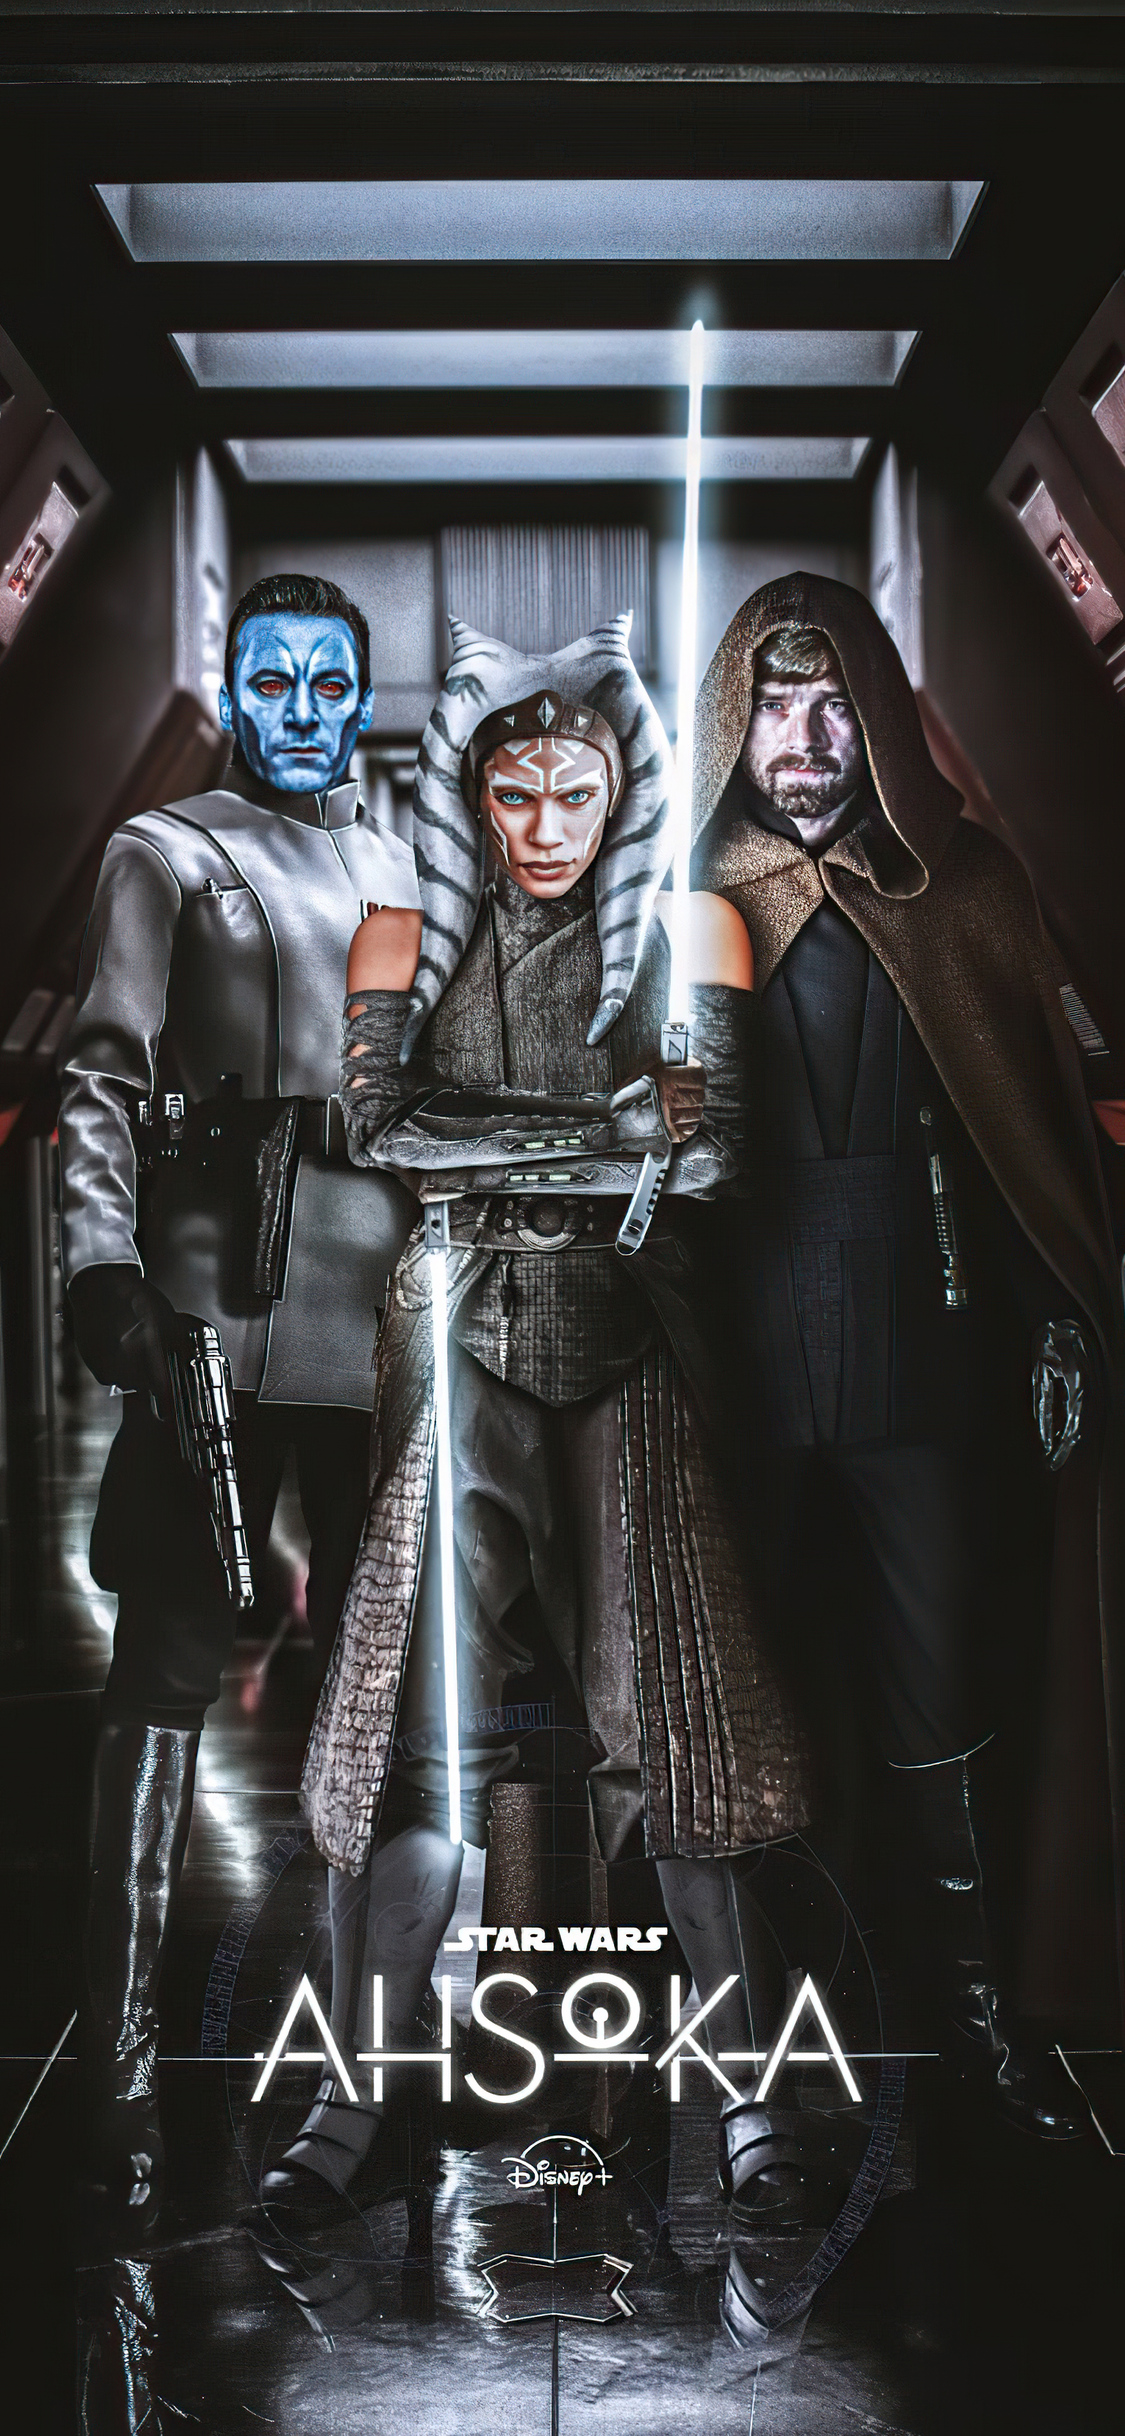 ahsoka-star-wars-poster-4k-g8.jpg